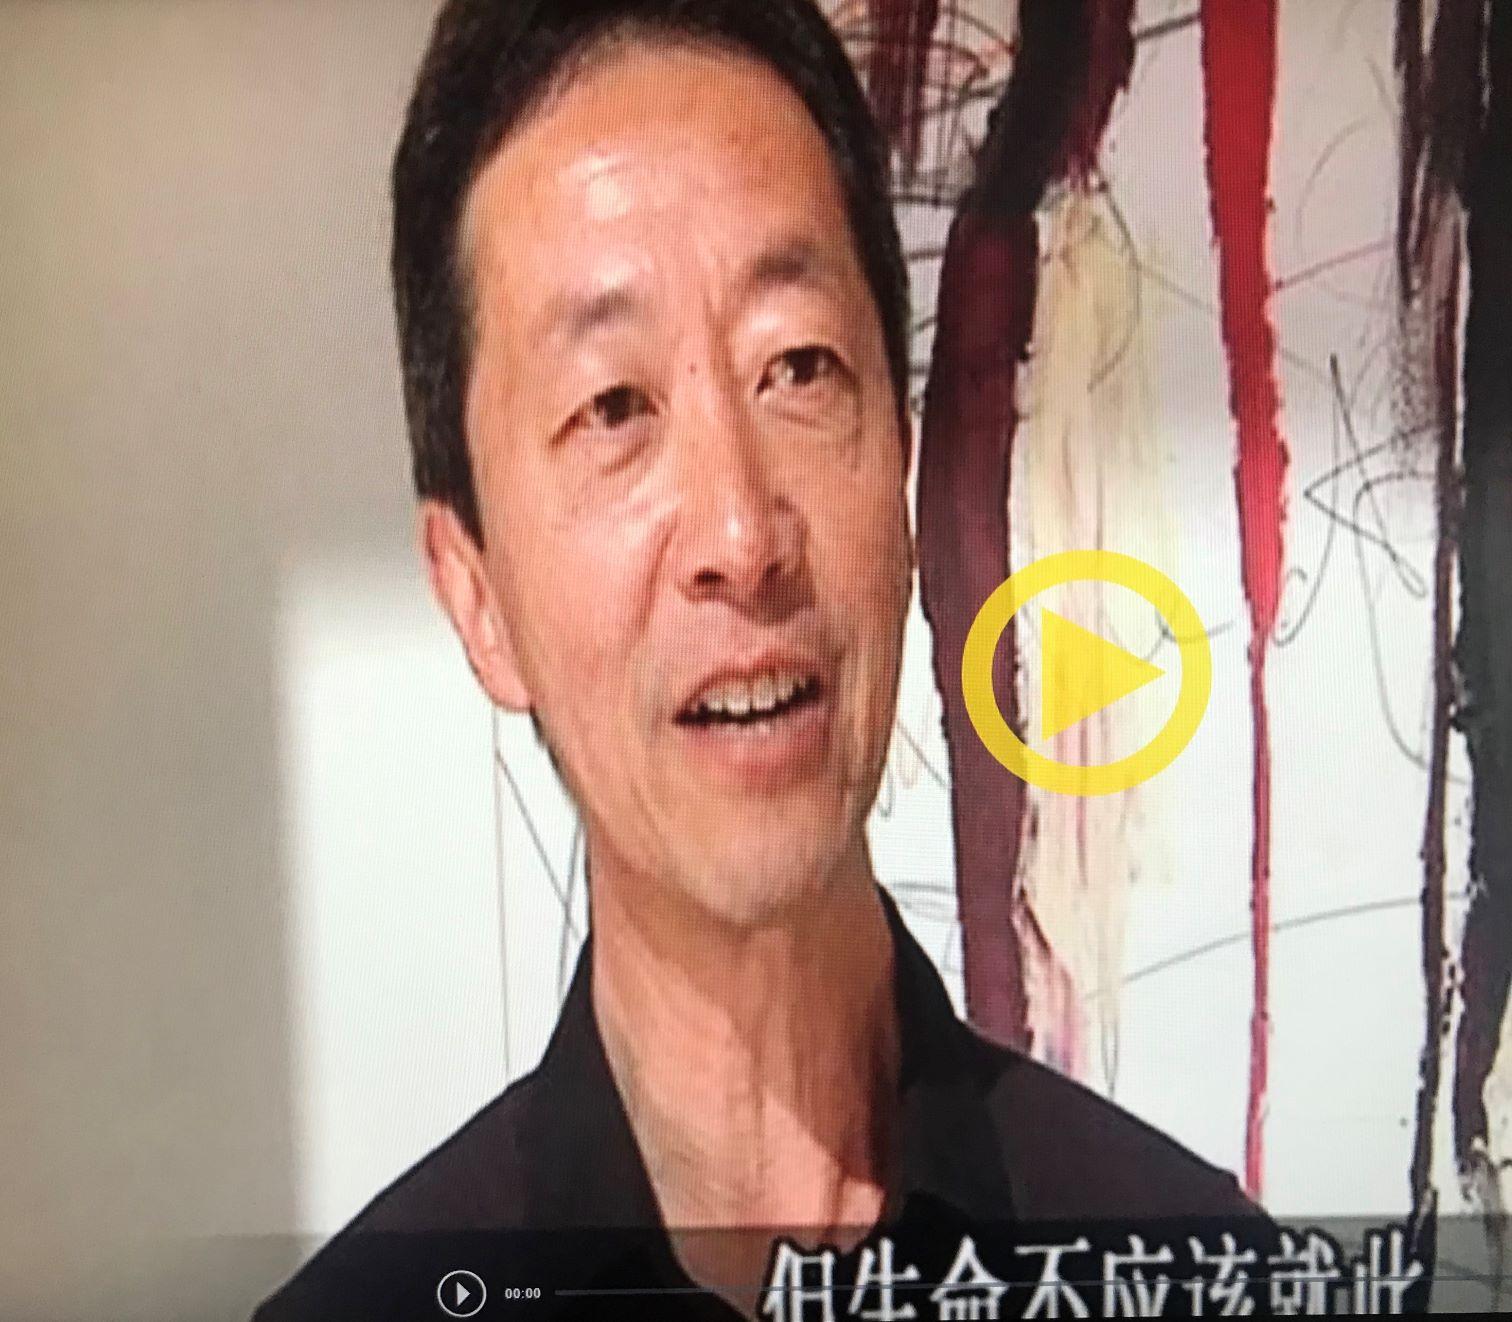 Art Atrium Simon Chan SBS low res